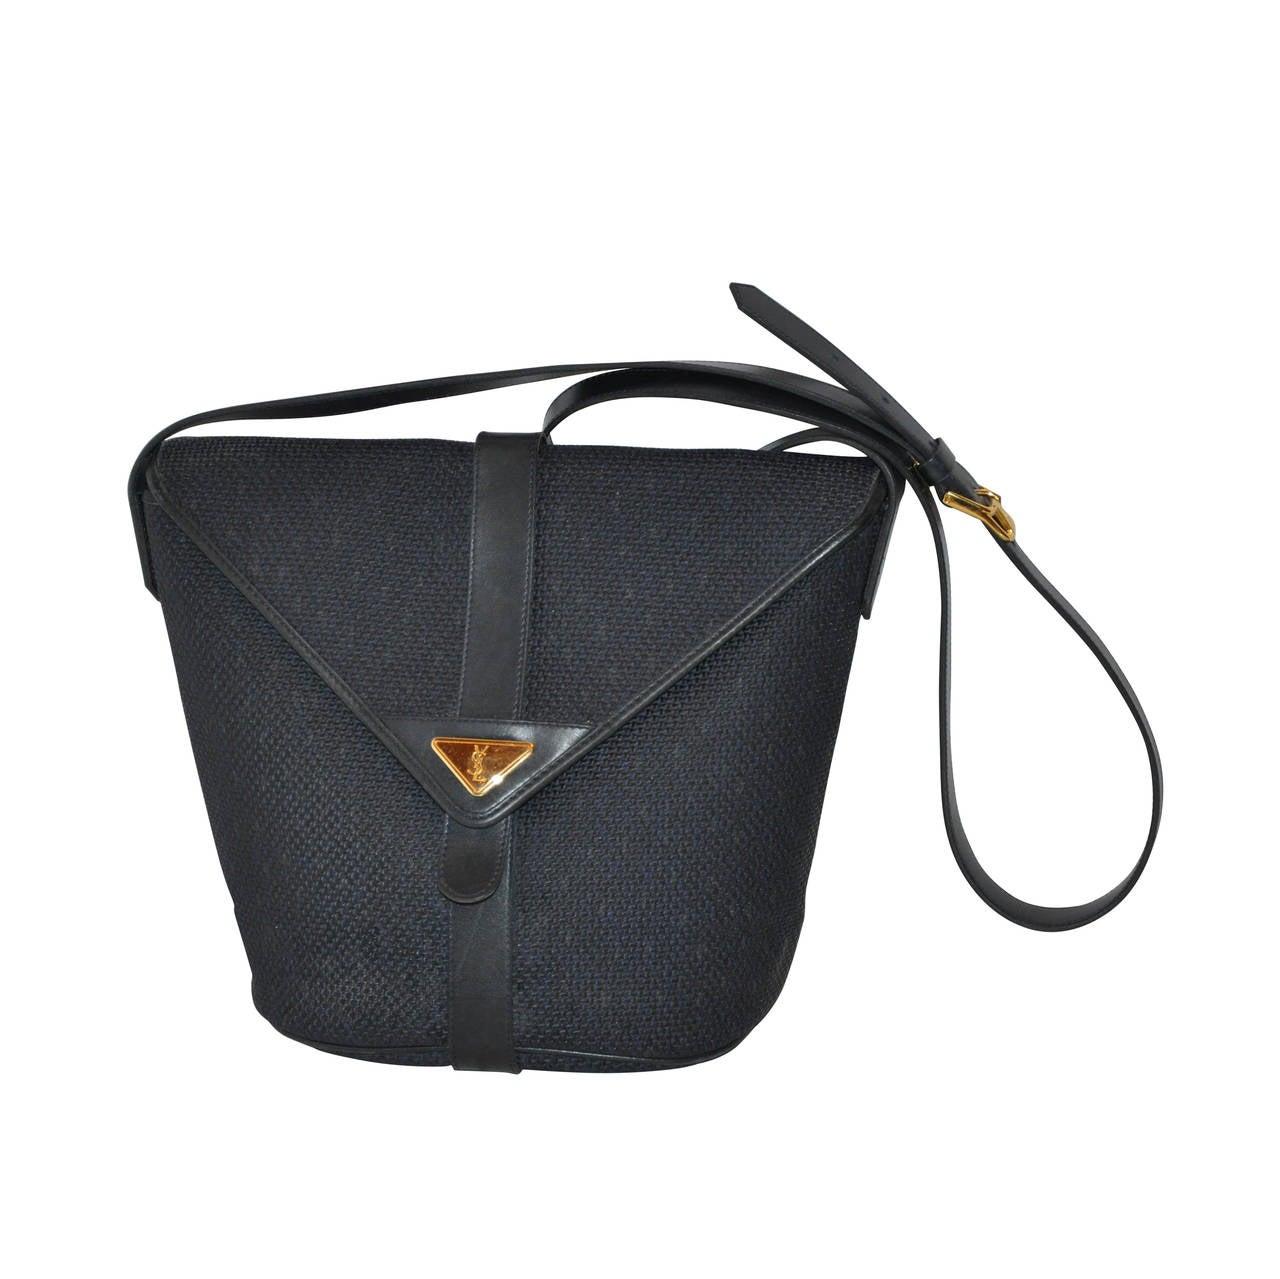 833e070129 Yves Saint Laurent Woven Weave Navy Flap-Over Shoulder Bag For Sale at  1stdibs